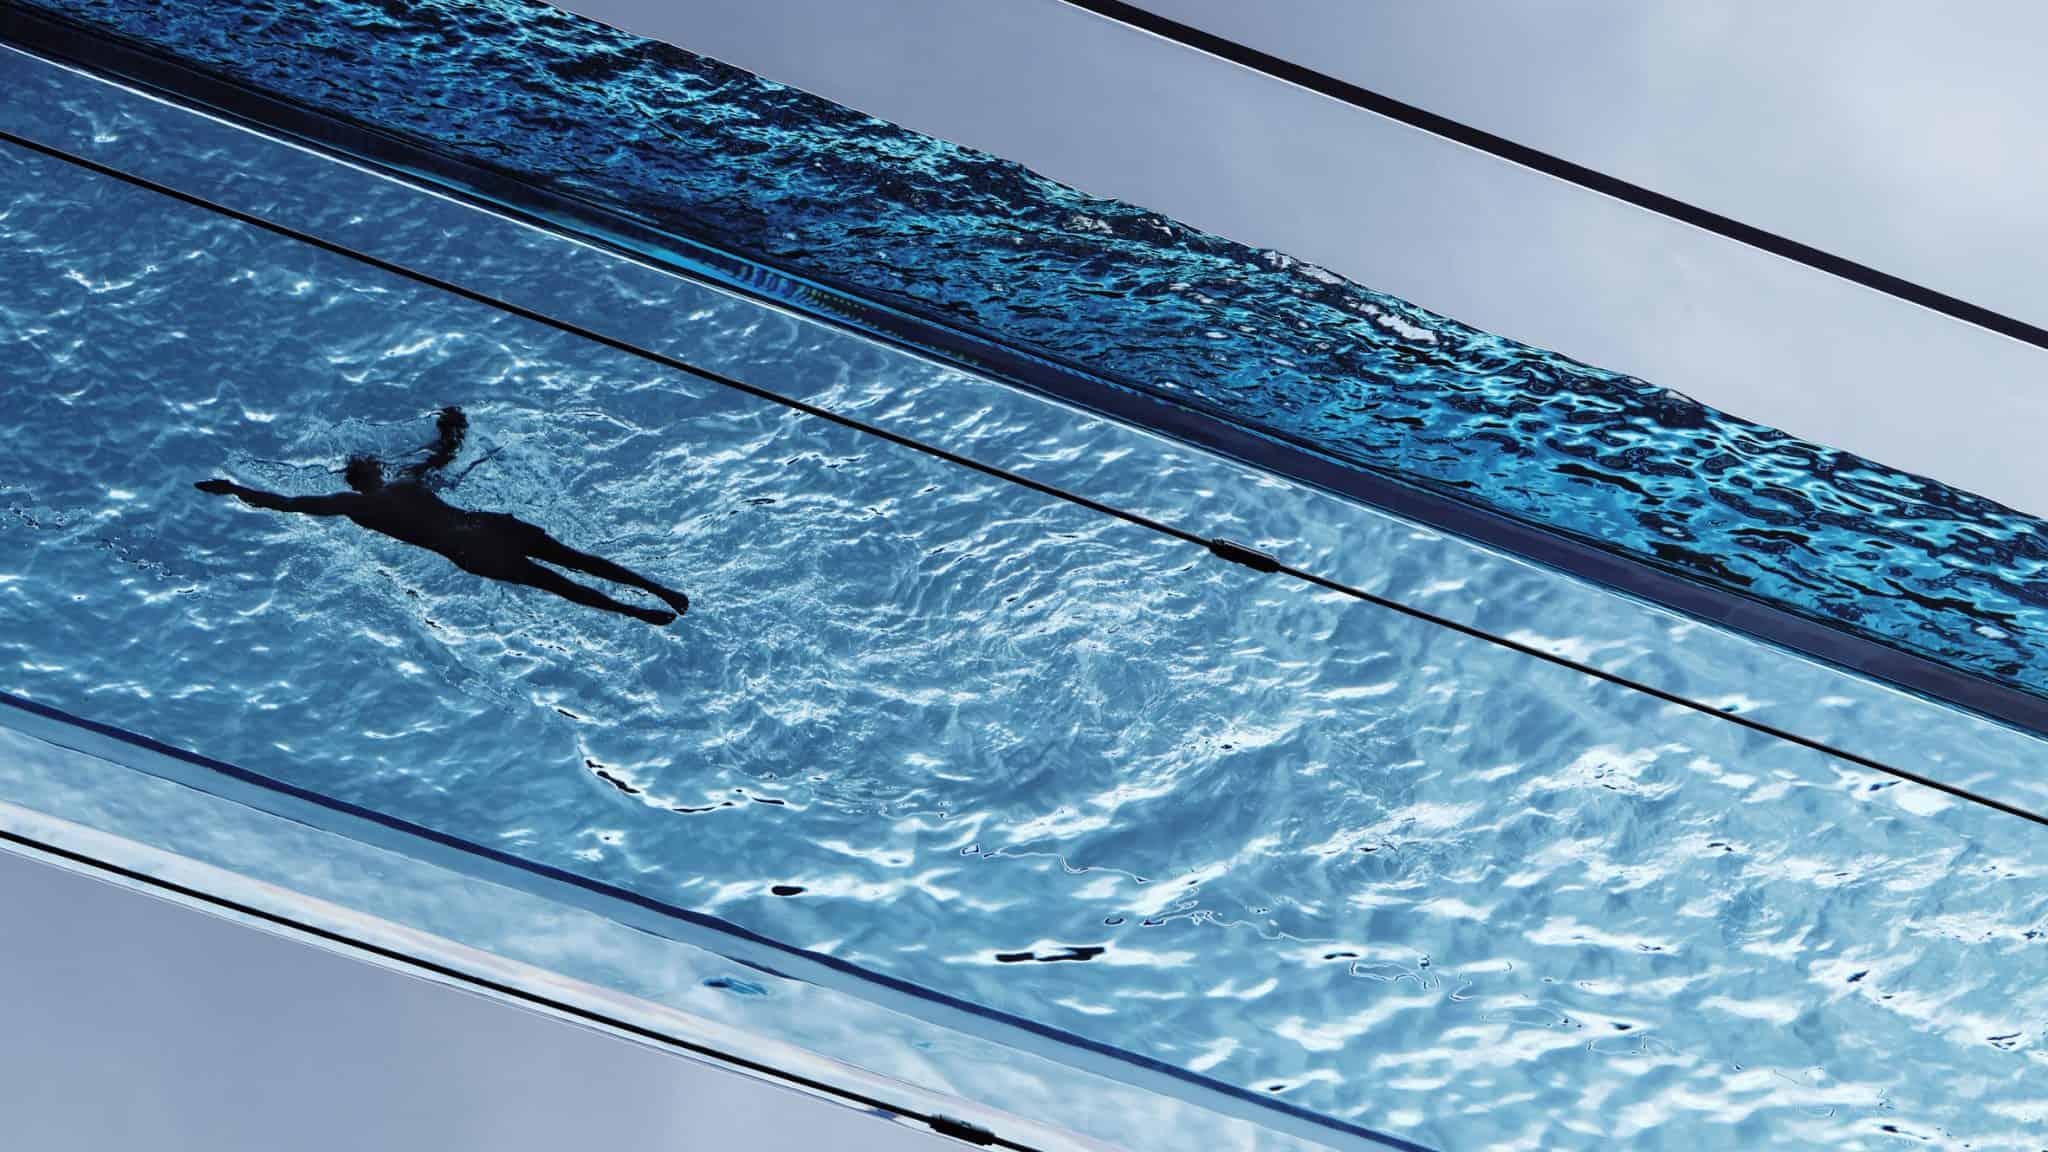 glazen zwembad in de lucht